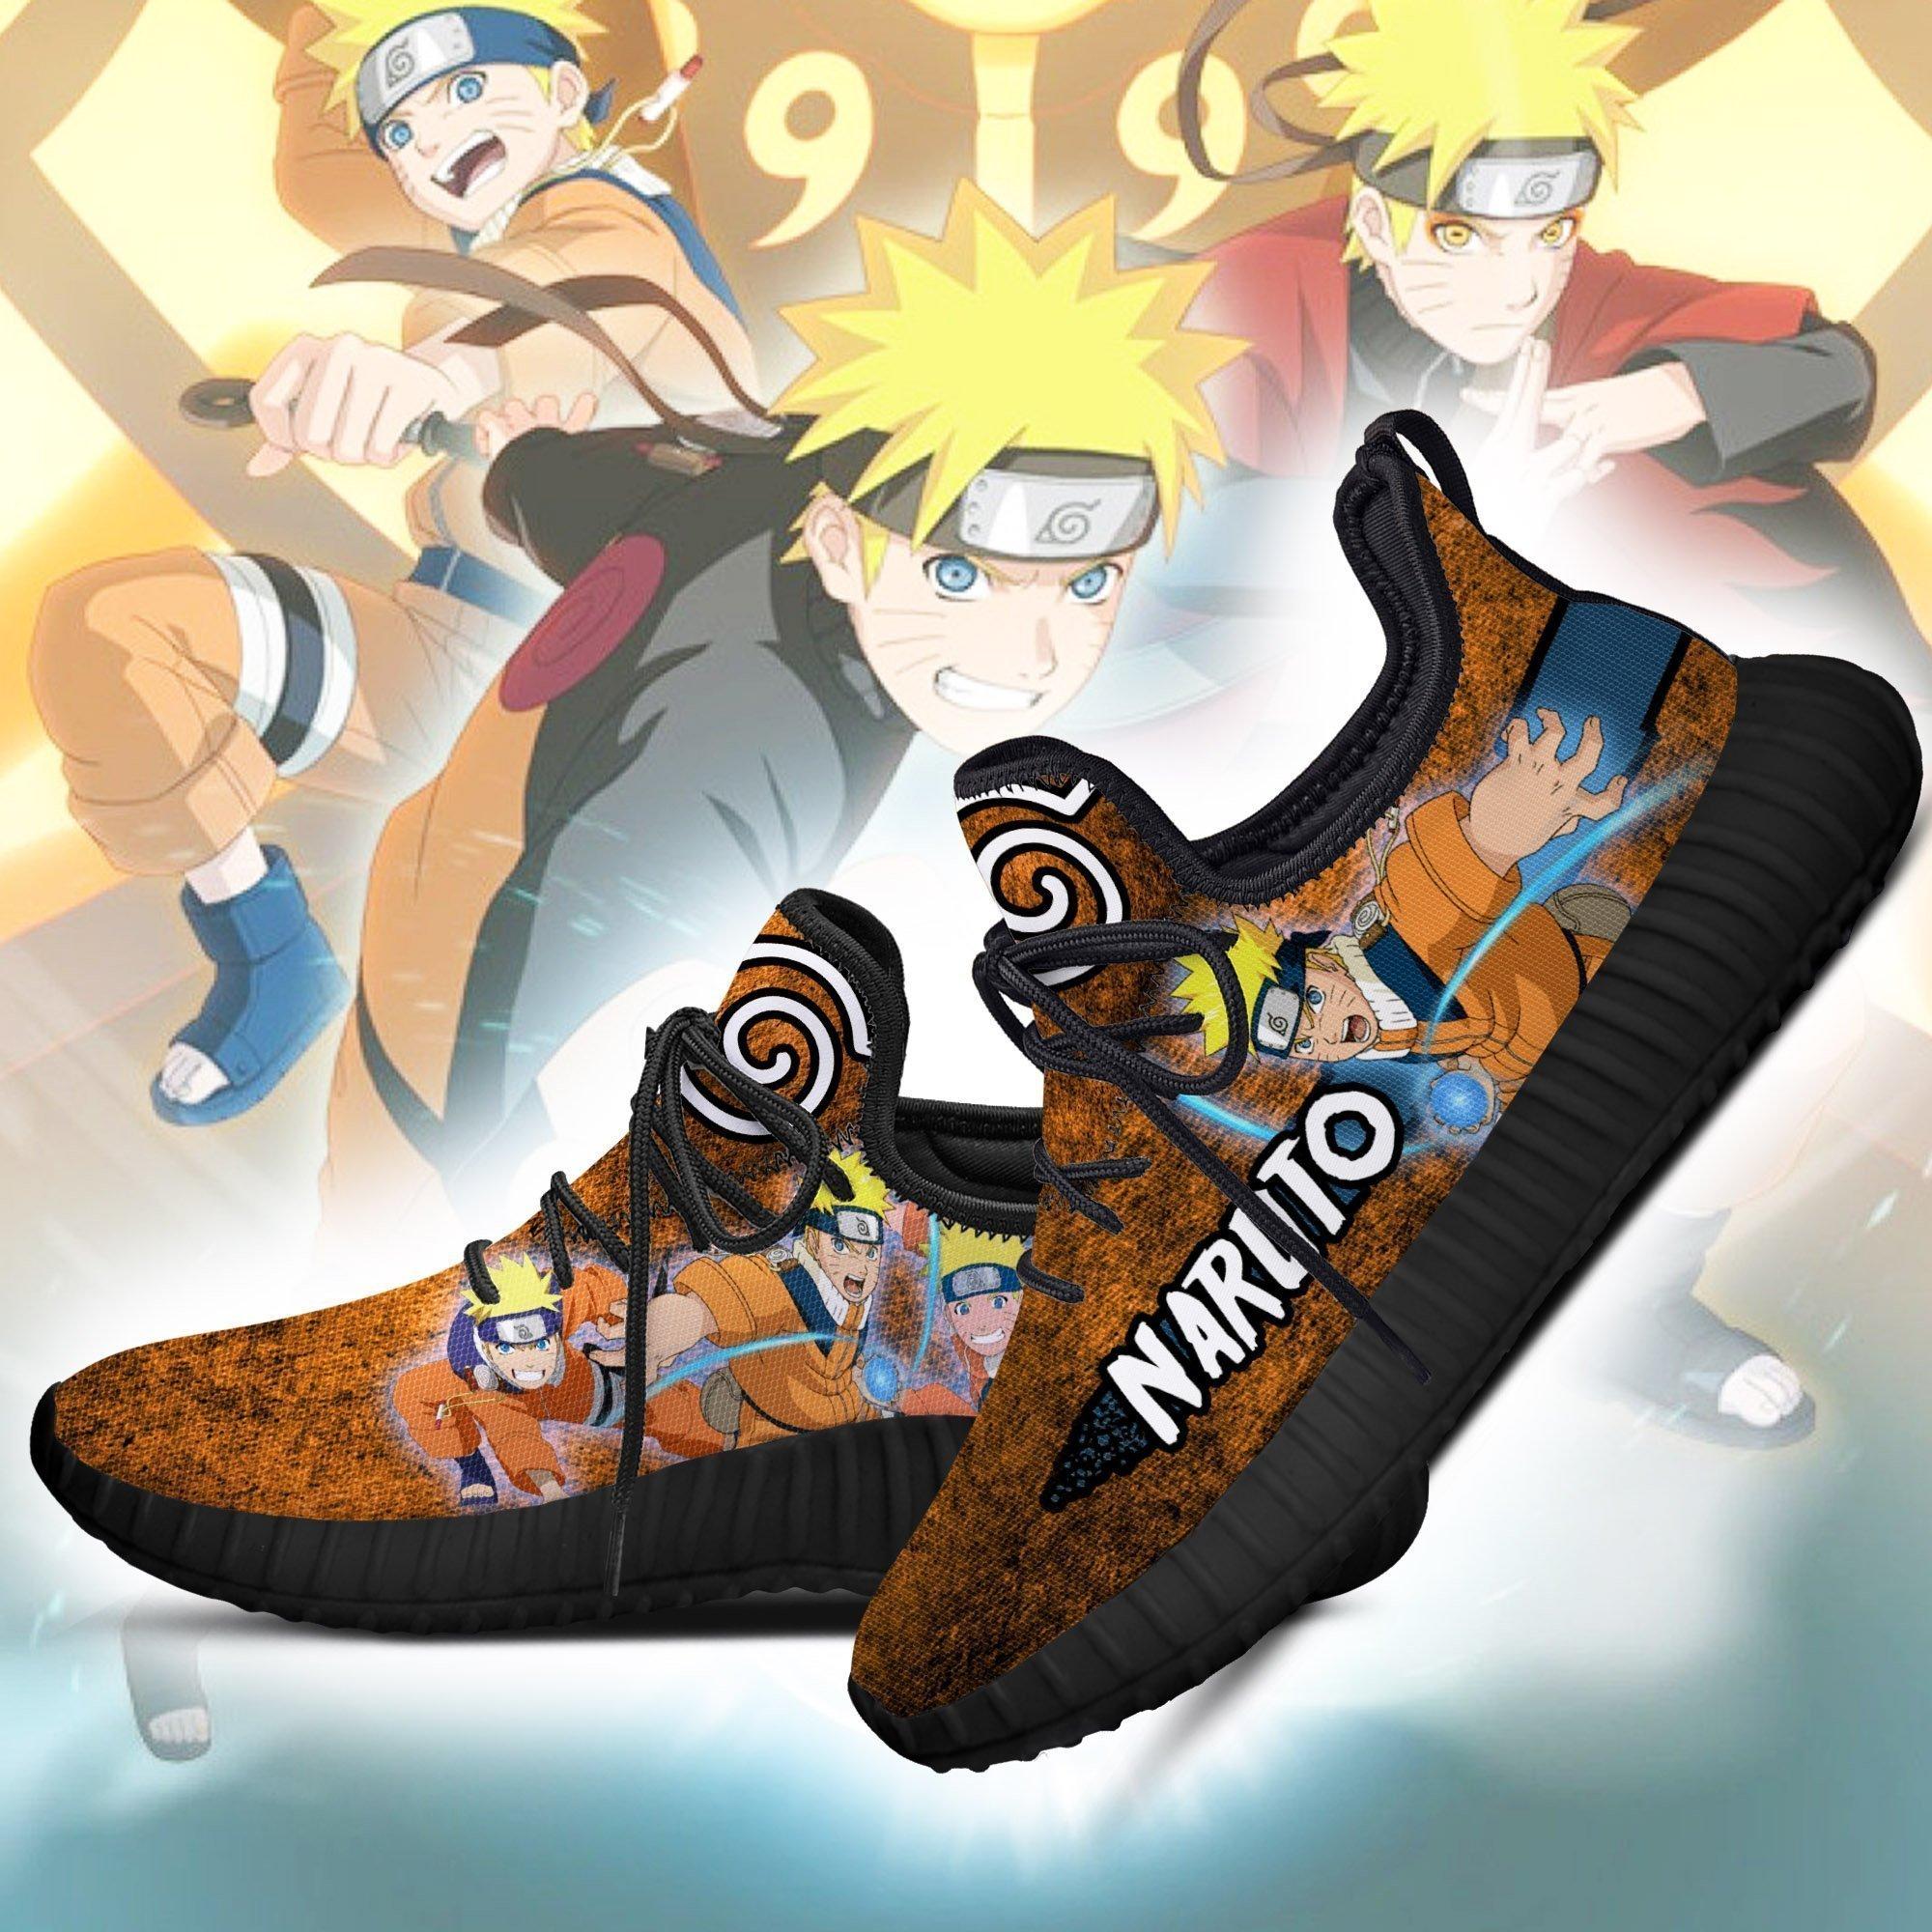 Naruto Jutsu Reze Shoes Naruto Anime Shoes Fan Gift Idea Tt05 Tazazoncom    Kuroprints